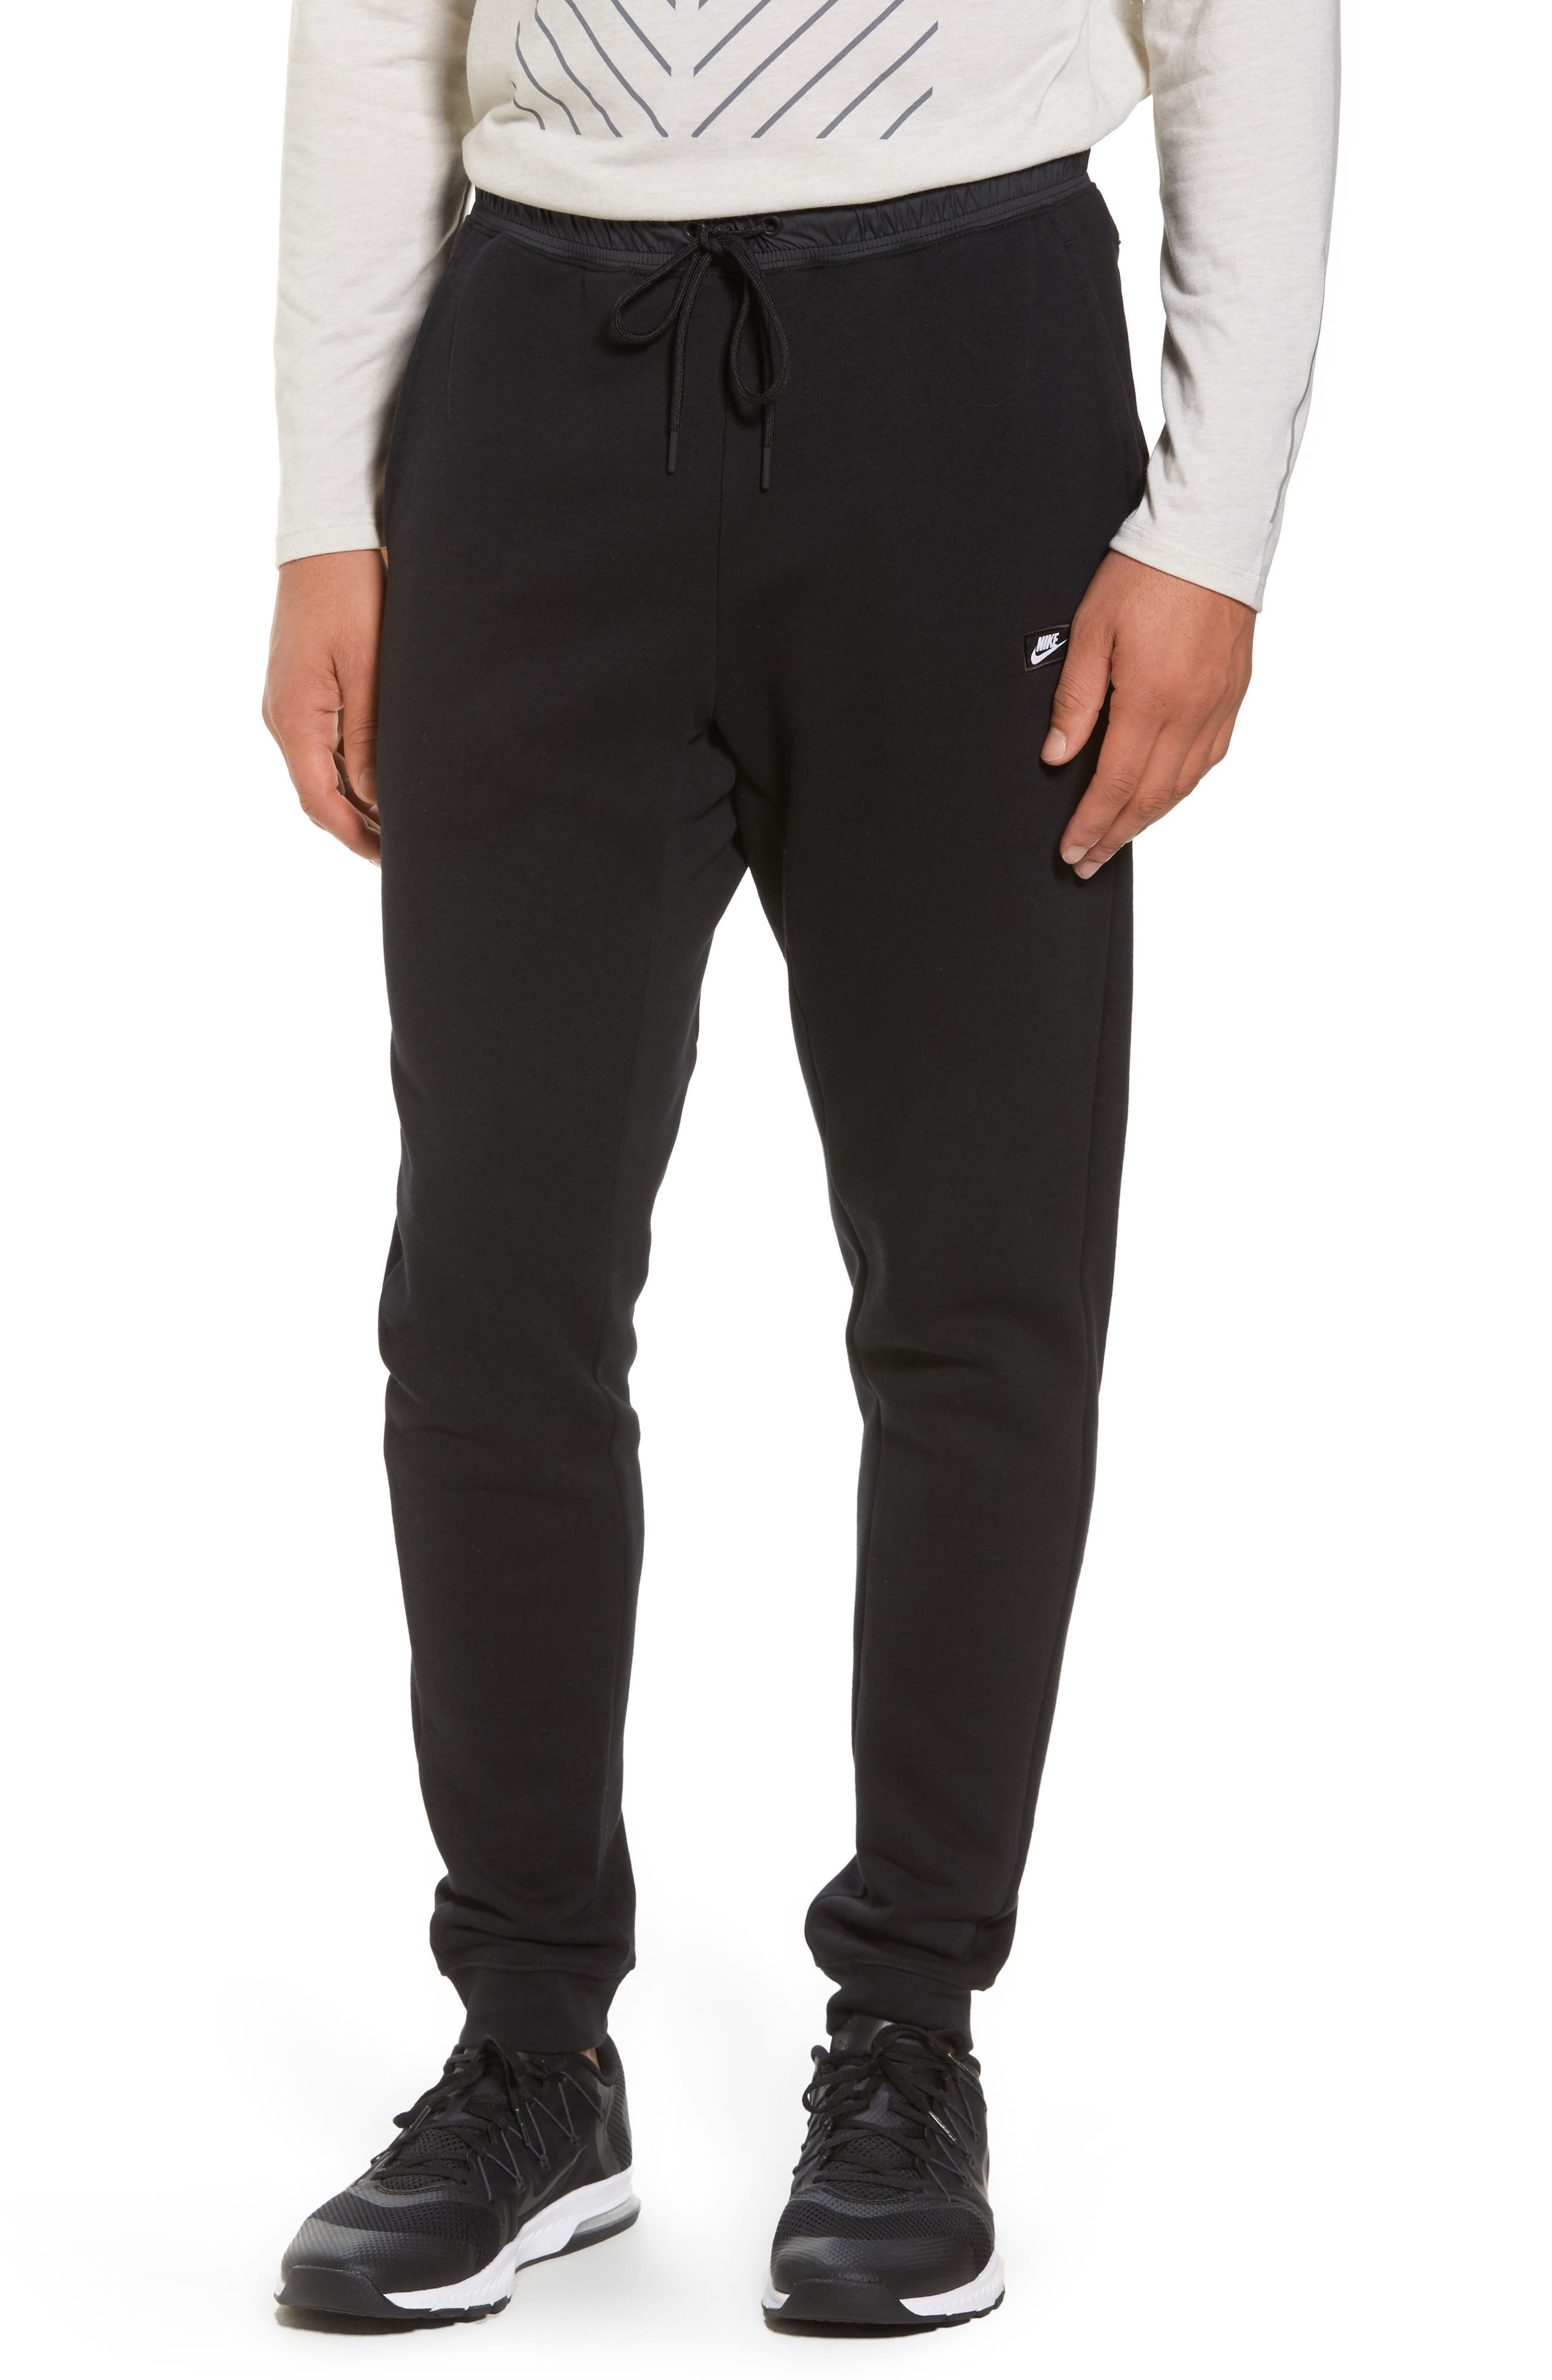 Tech Fleece Jogger Pants,                         Main,                         color, Black/ Black